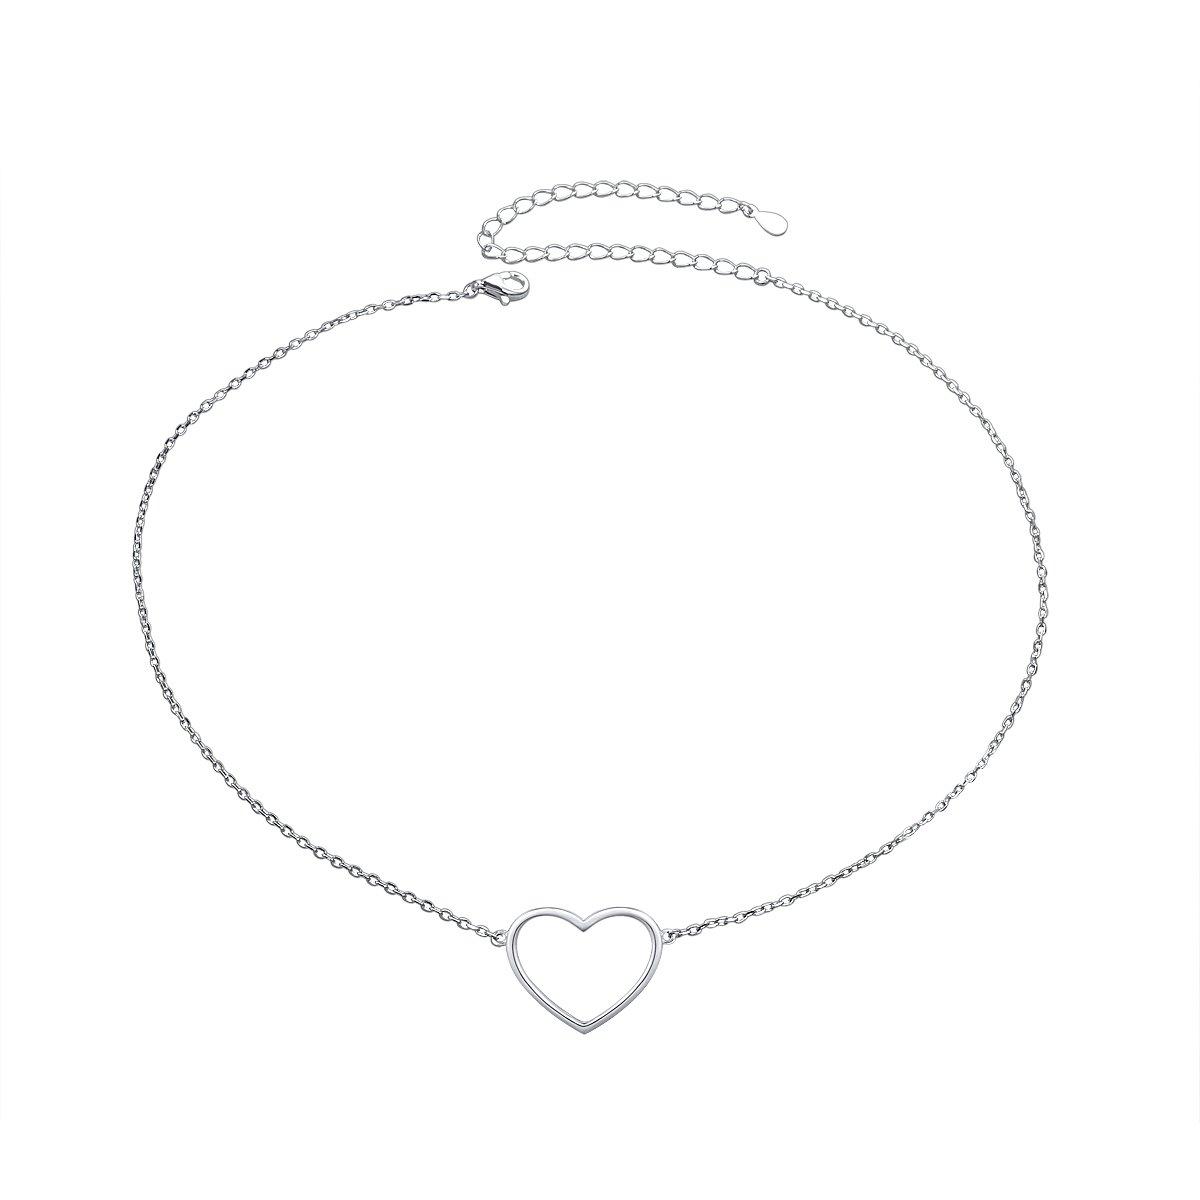 SILVER MOUNTAIN S925 Sterling Silver Choker Minimalist Dainty Statement Heart Pendant Necklace for Women Girl Lady